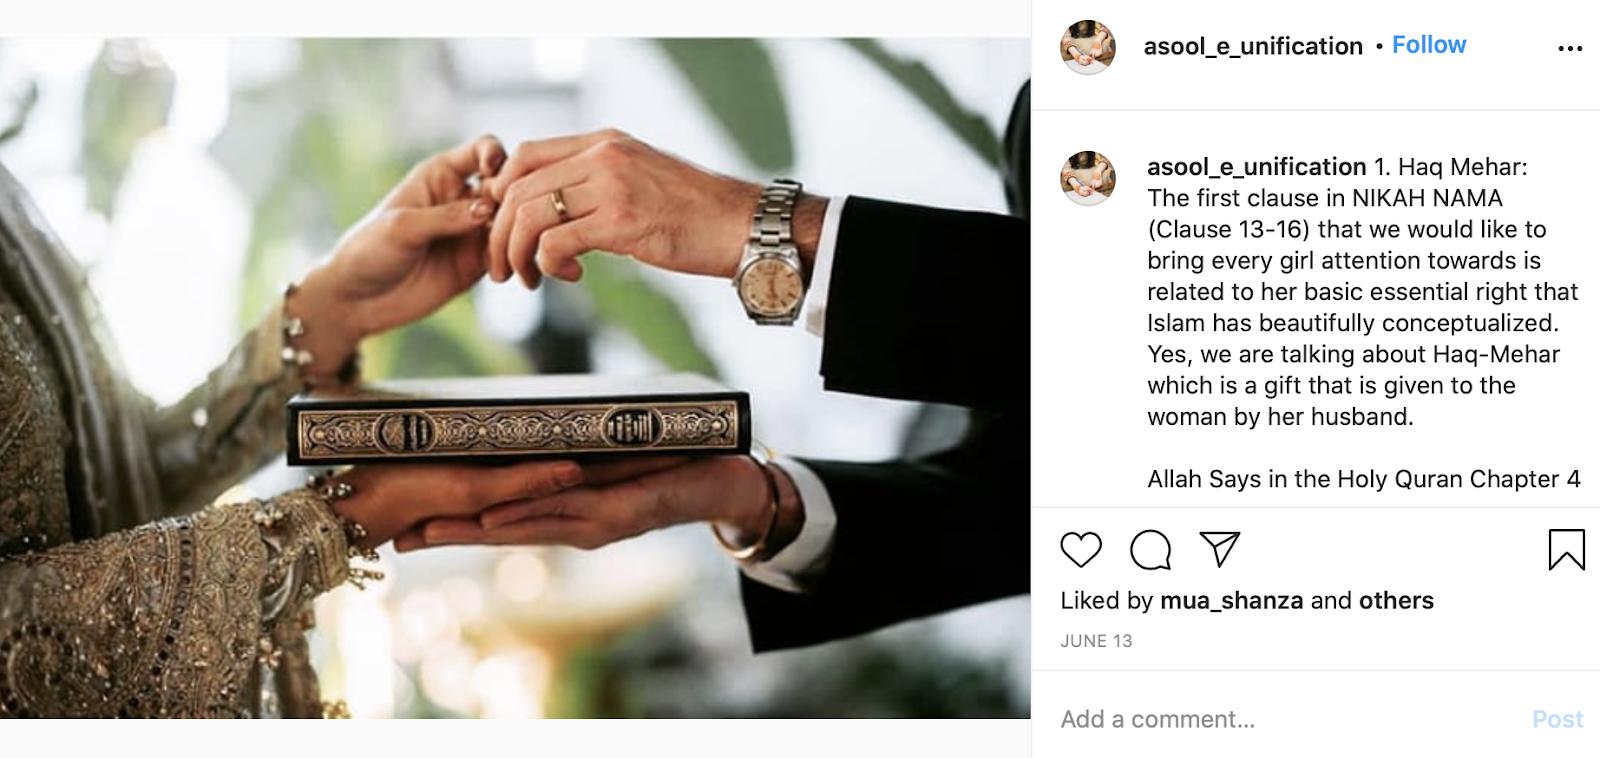 Nikah-Nama at Islamic wedding ceremony